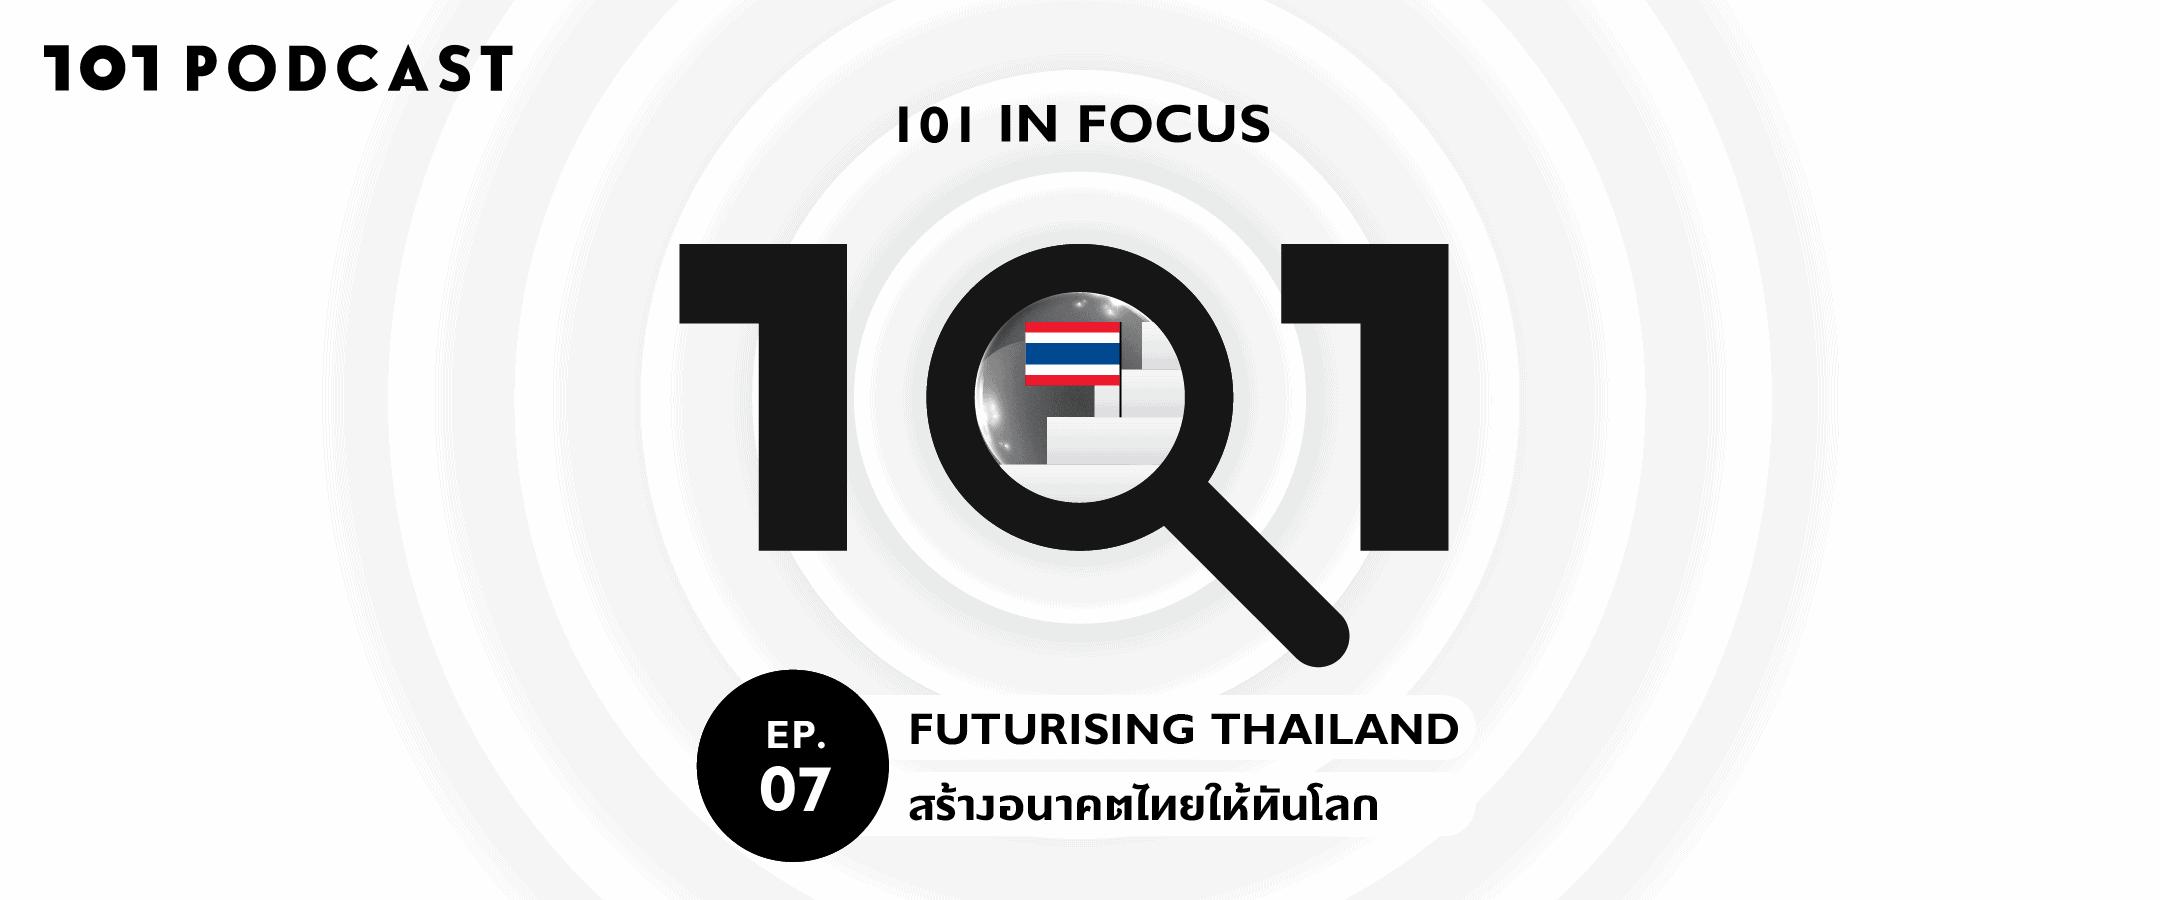 101 in focus EP.7 Futurising Thailand - สร้างอนาคตไทยให้ทันโลก